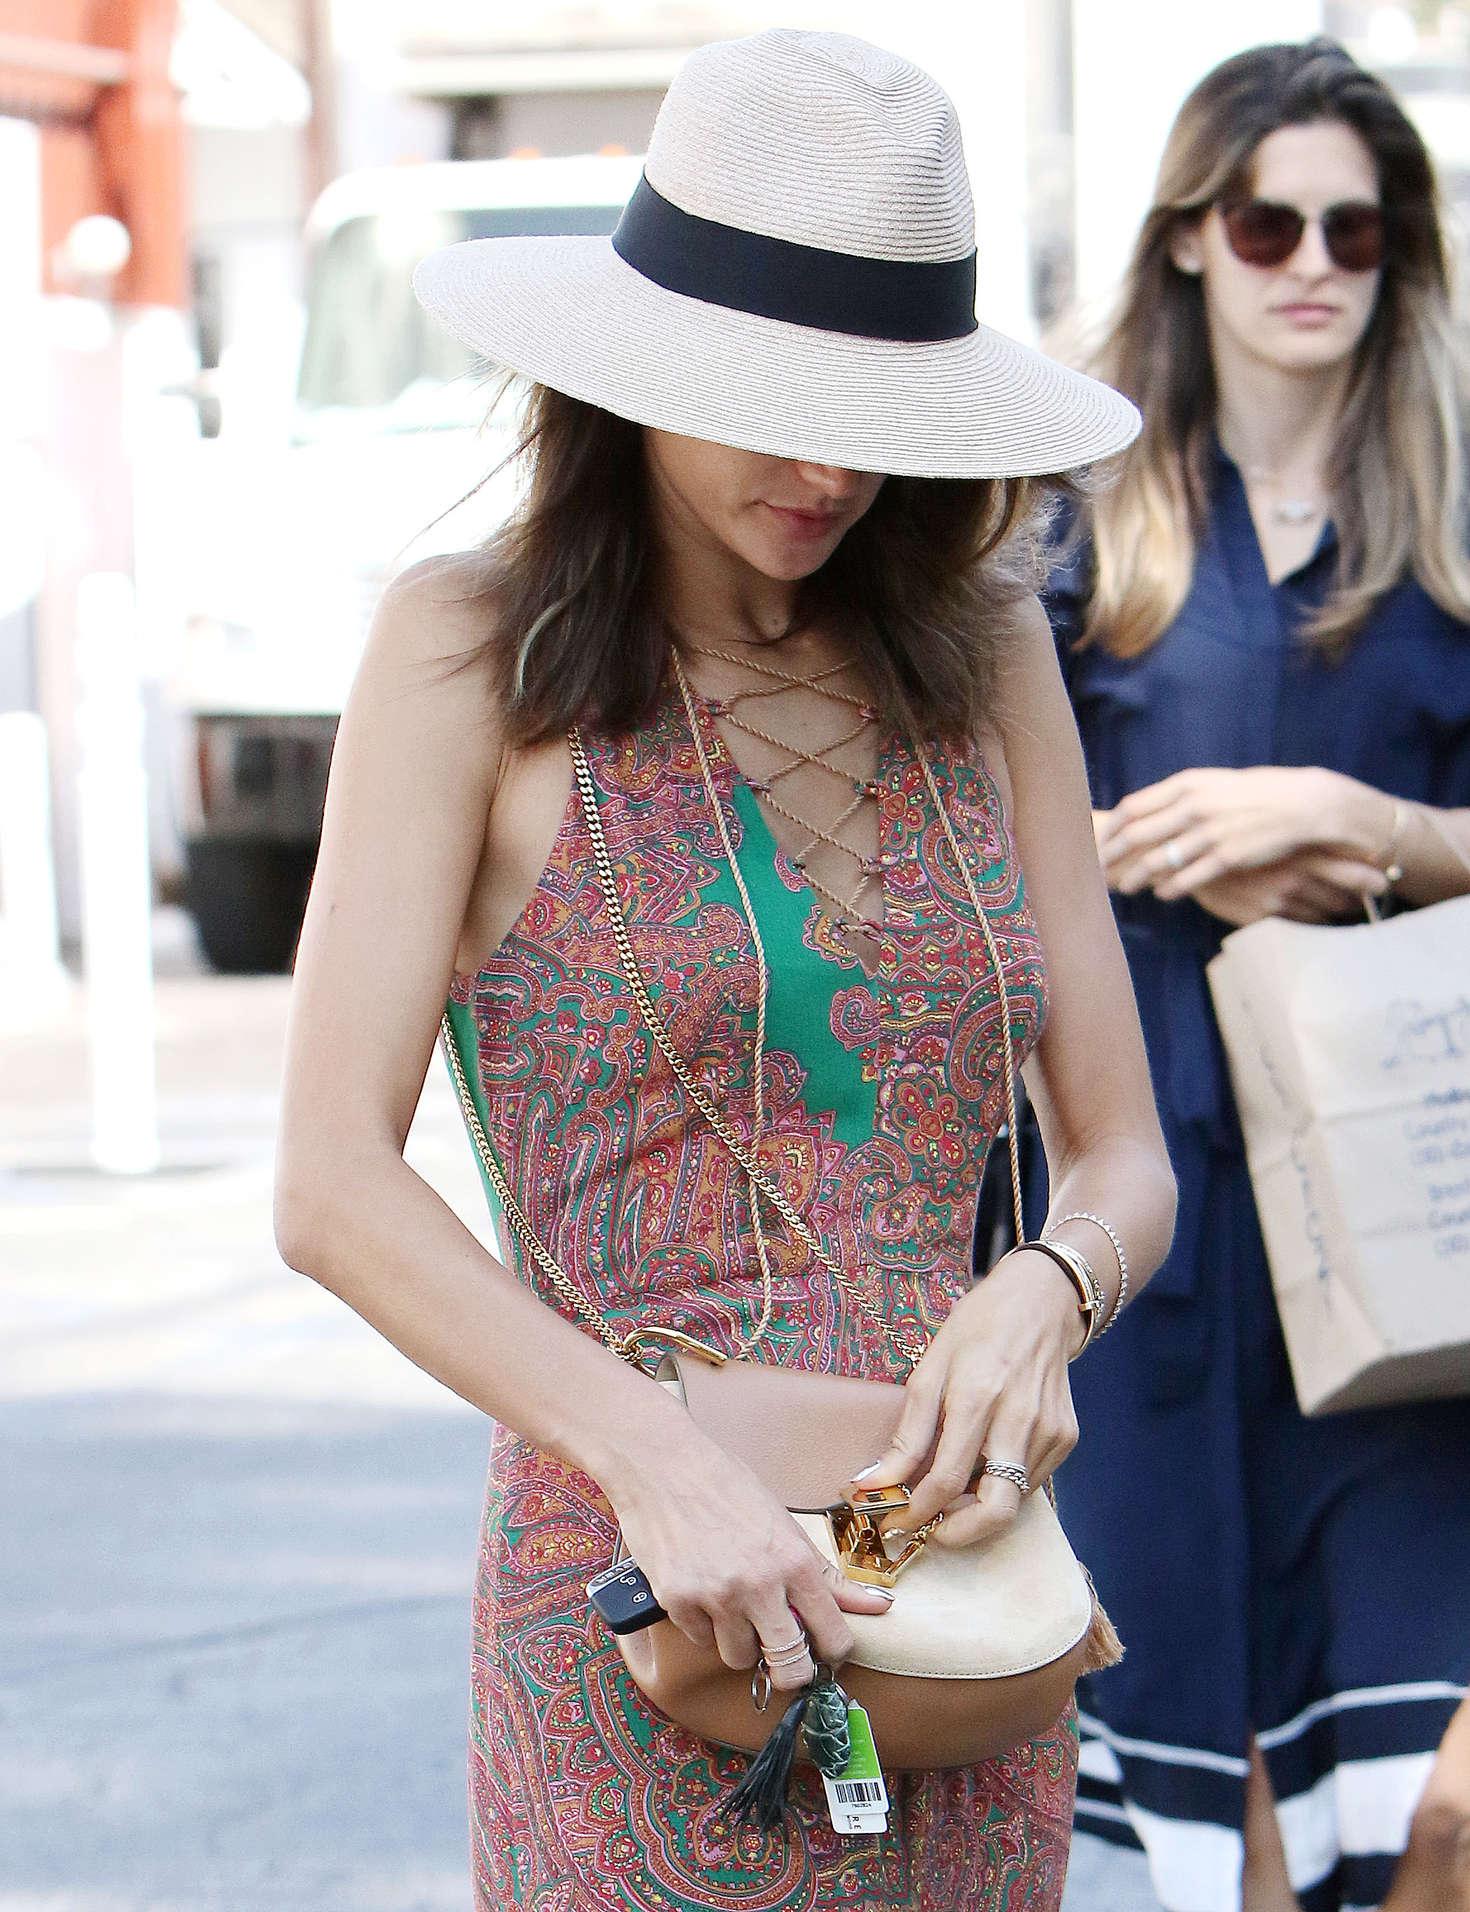 Alessandra Ambrosio 2016 : Alessandra Ambrosio in Long Summer Dress -04